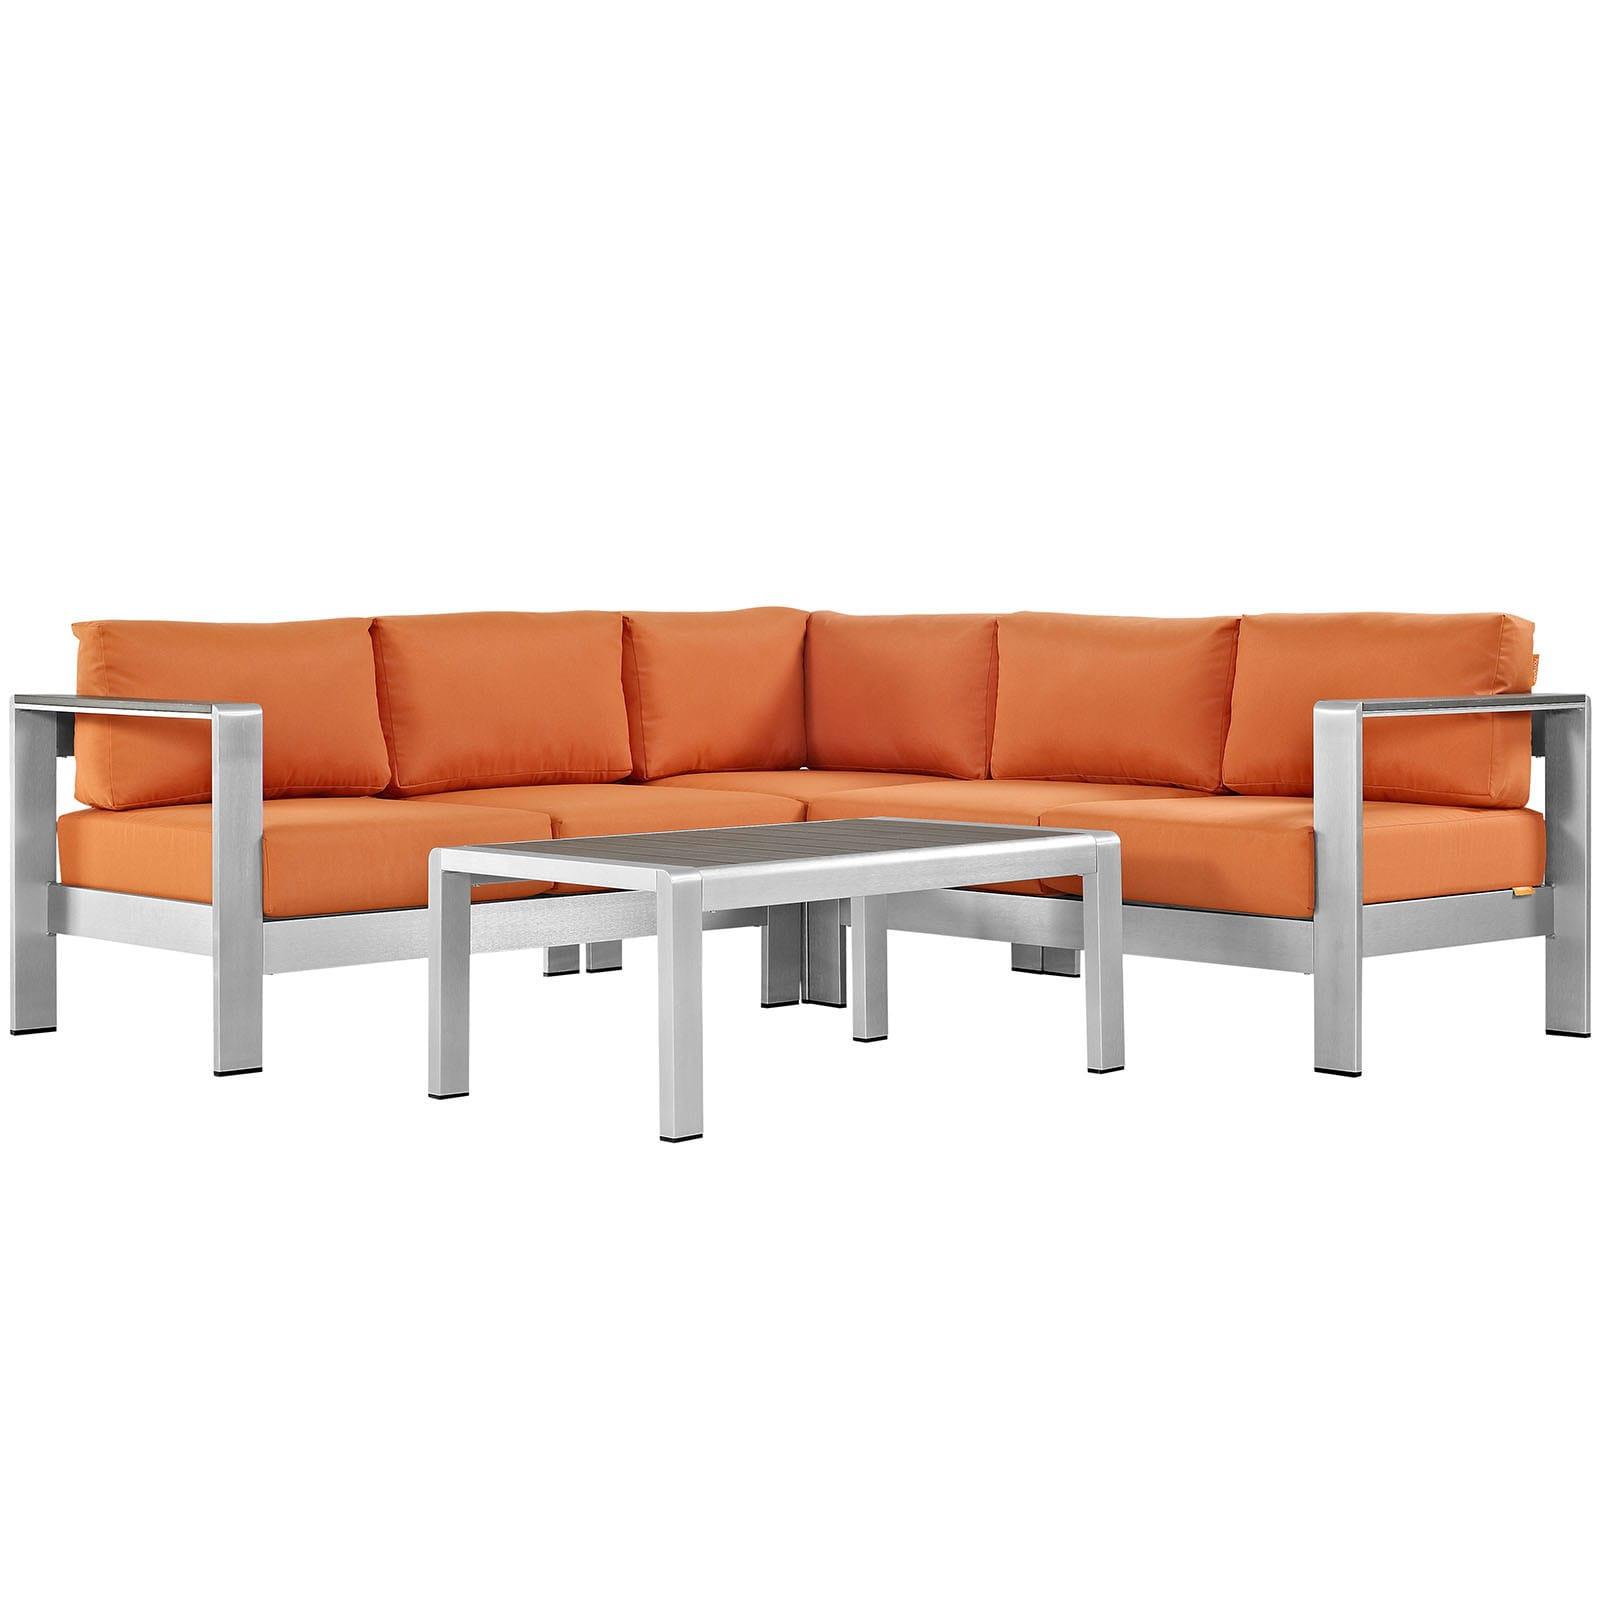 Shore 4 Piece Outdoor Patio Aluminum Sectional Sofa Set Free